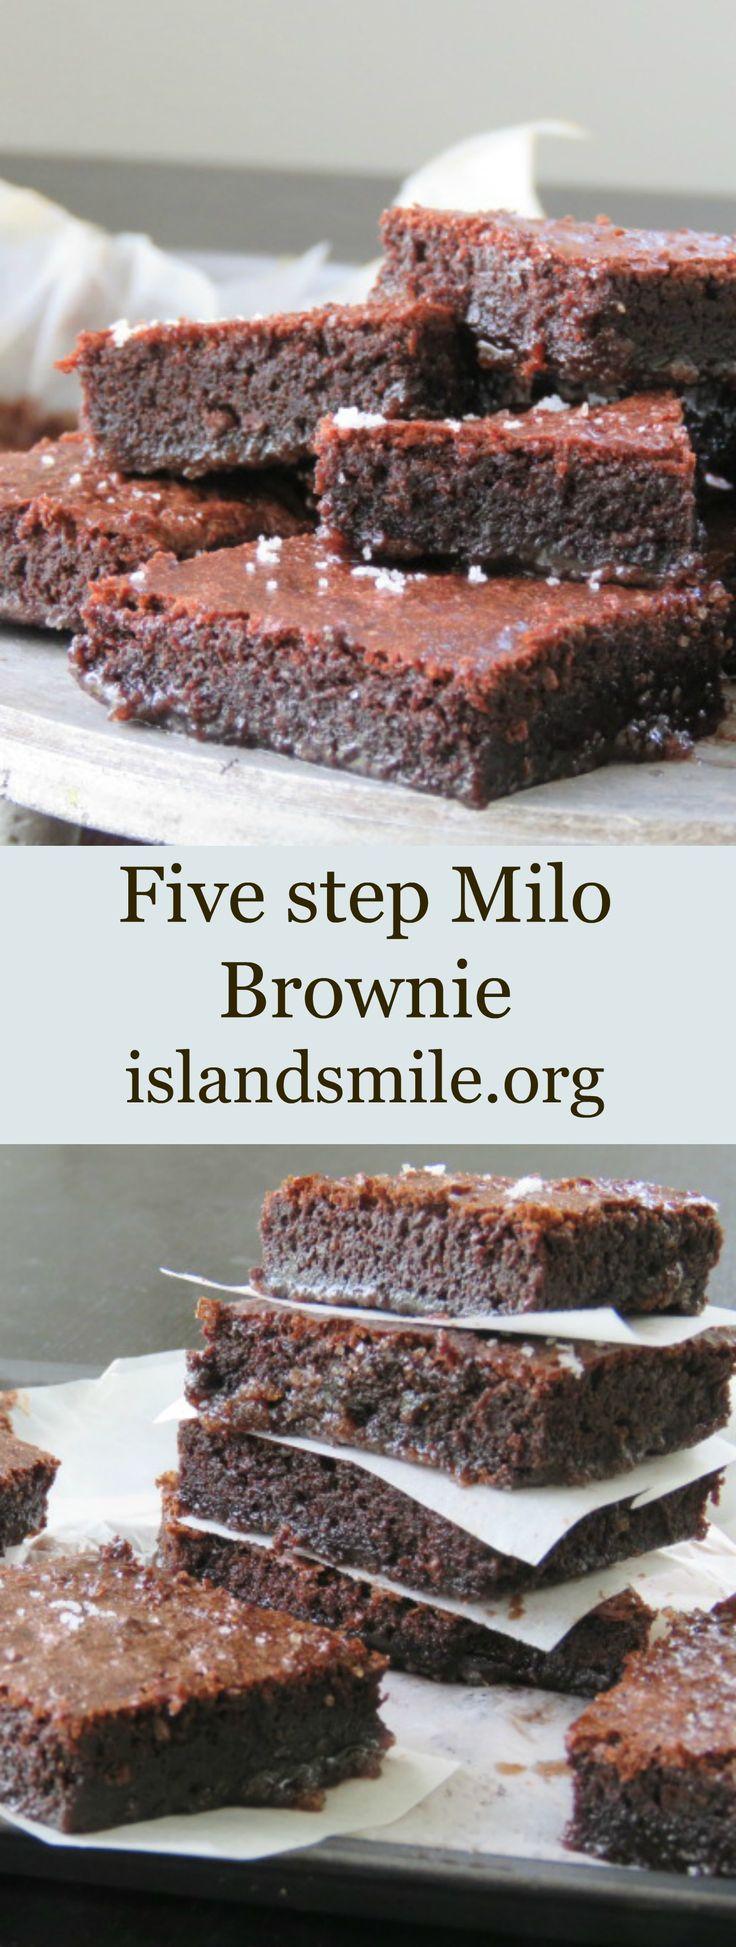 five step milo brownie Ingredients 3 Eggs 1 Teaspoon of Vanilla extract 3/4 vegetable oil 1 1/2 cup sugar 3/4 cup flour 1/2 cup Milo 2 Tablespoons of Cocoa Powder 1 1/2 teaspoon Baking Powder